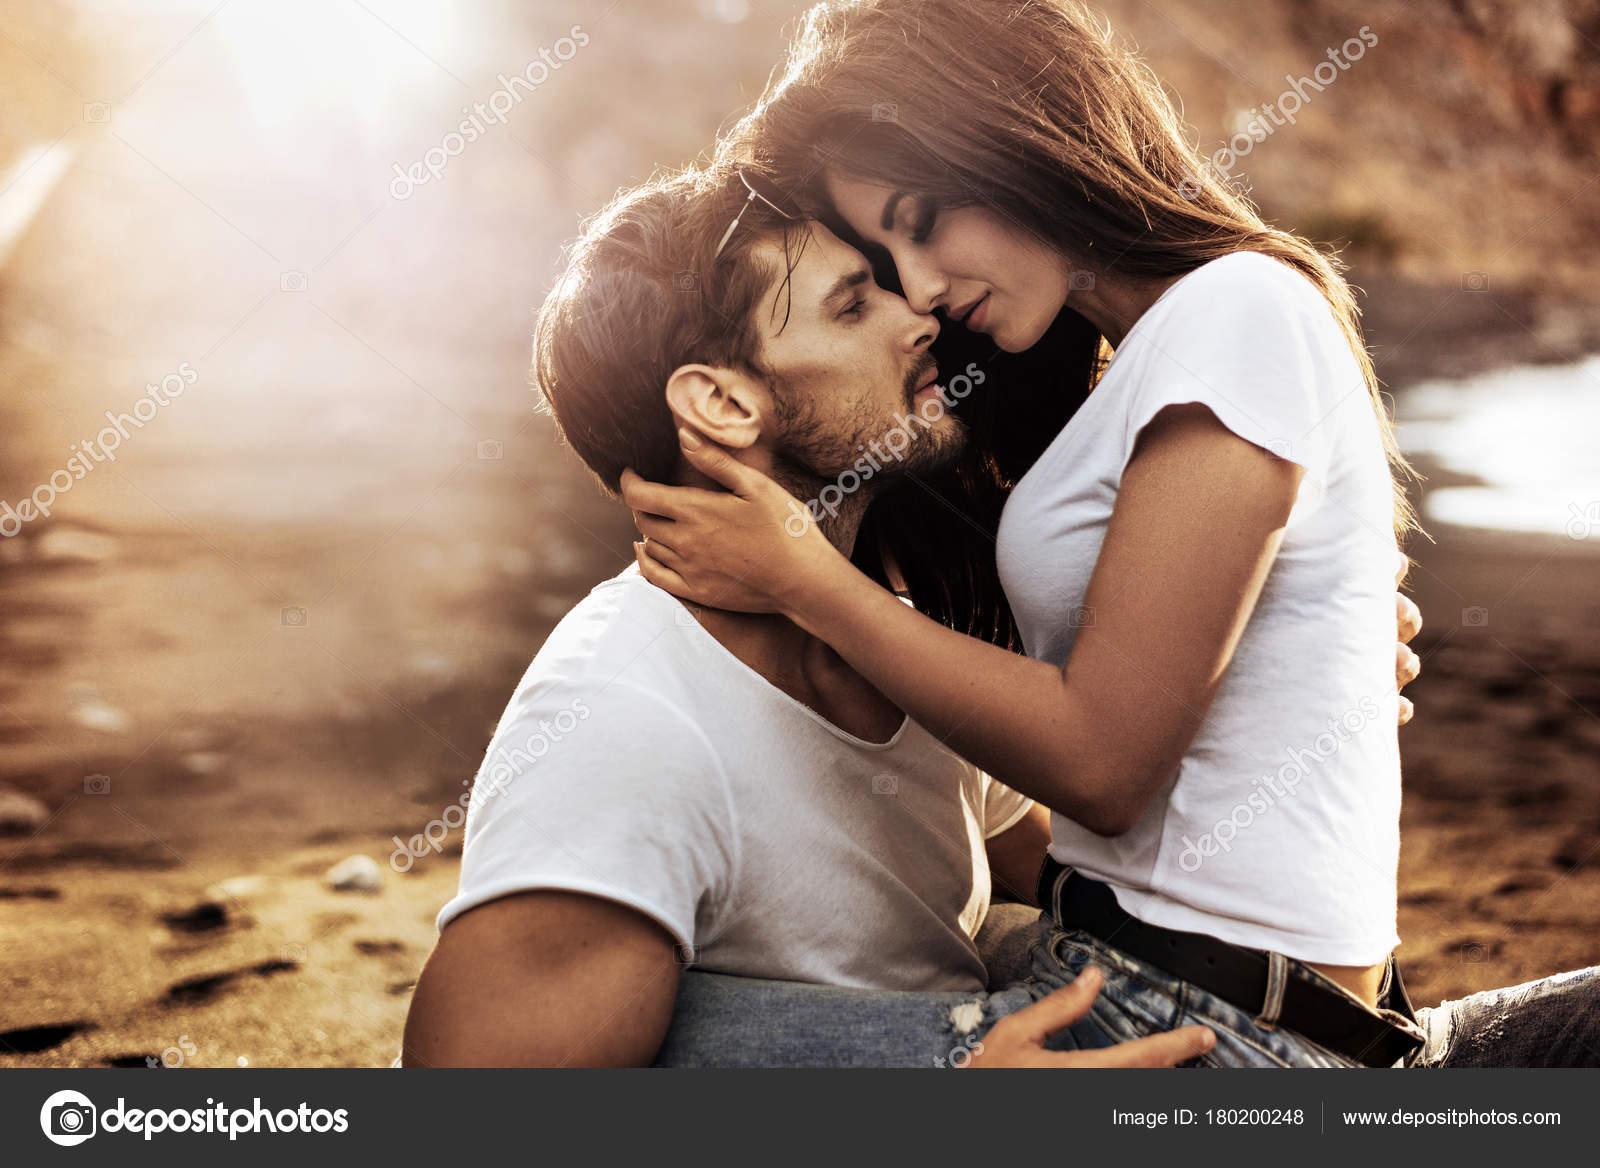 Romantic Couple Pictures Images Stock Photos Depositphotos